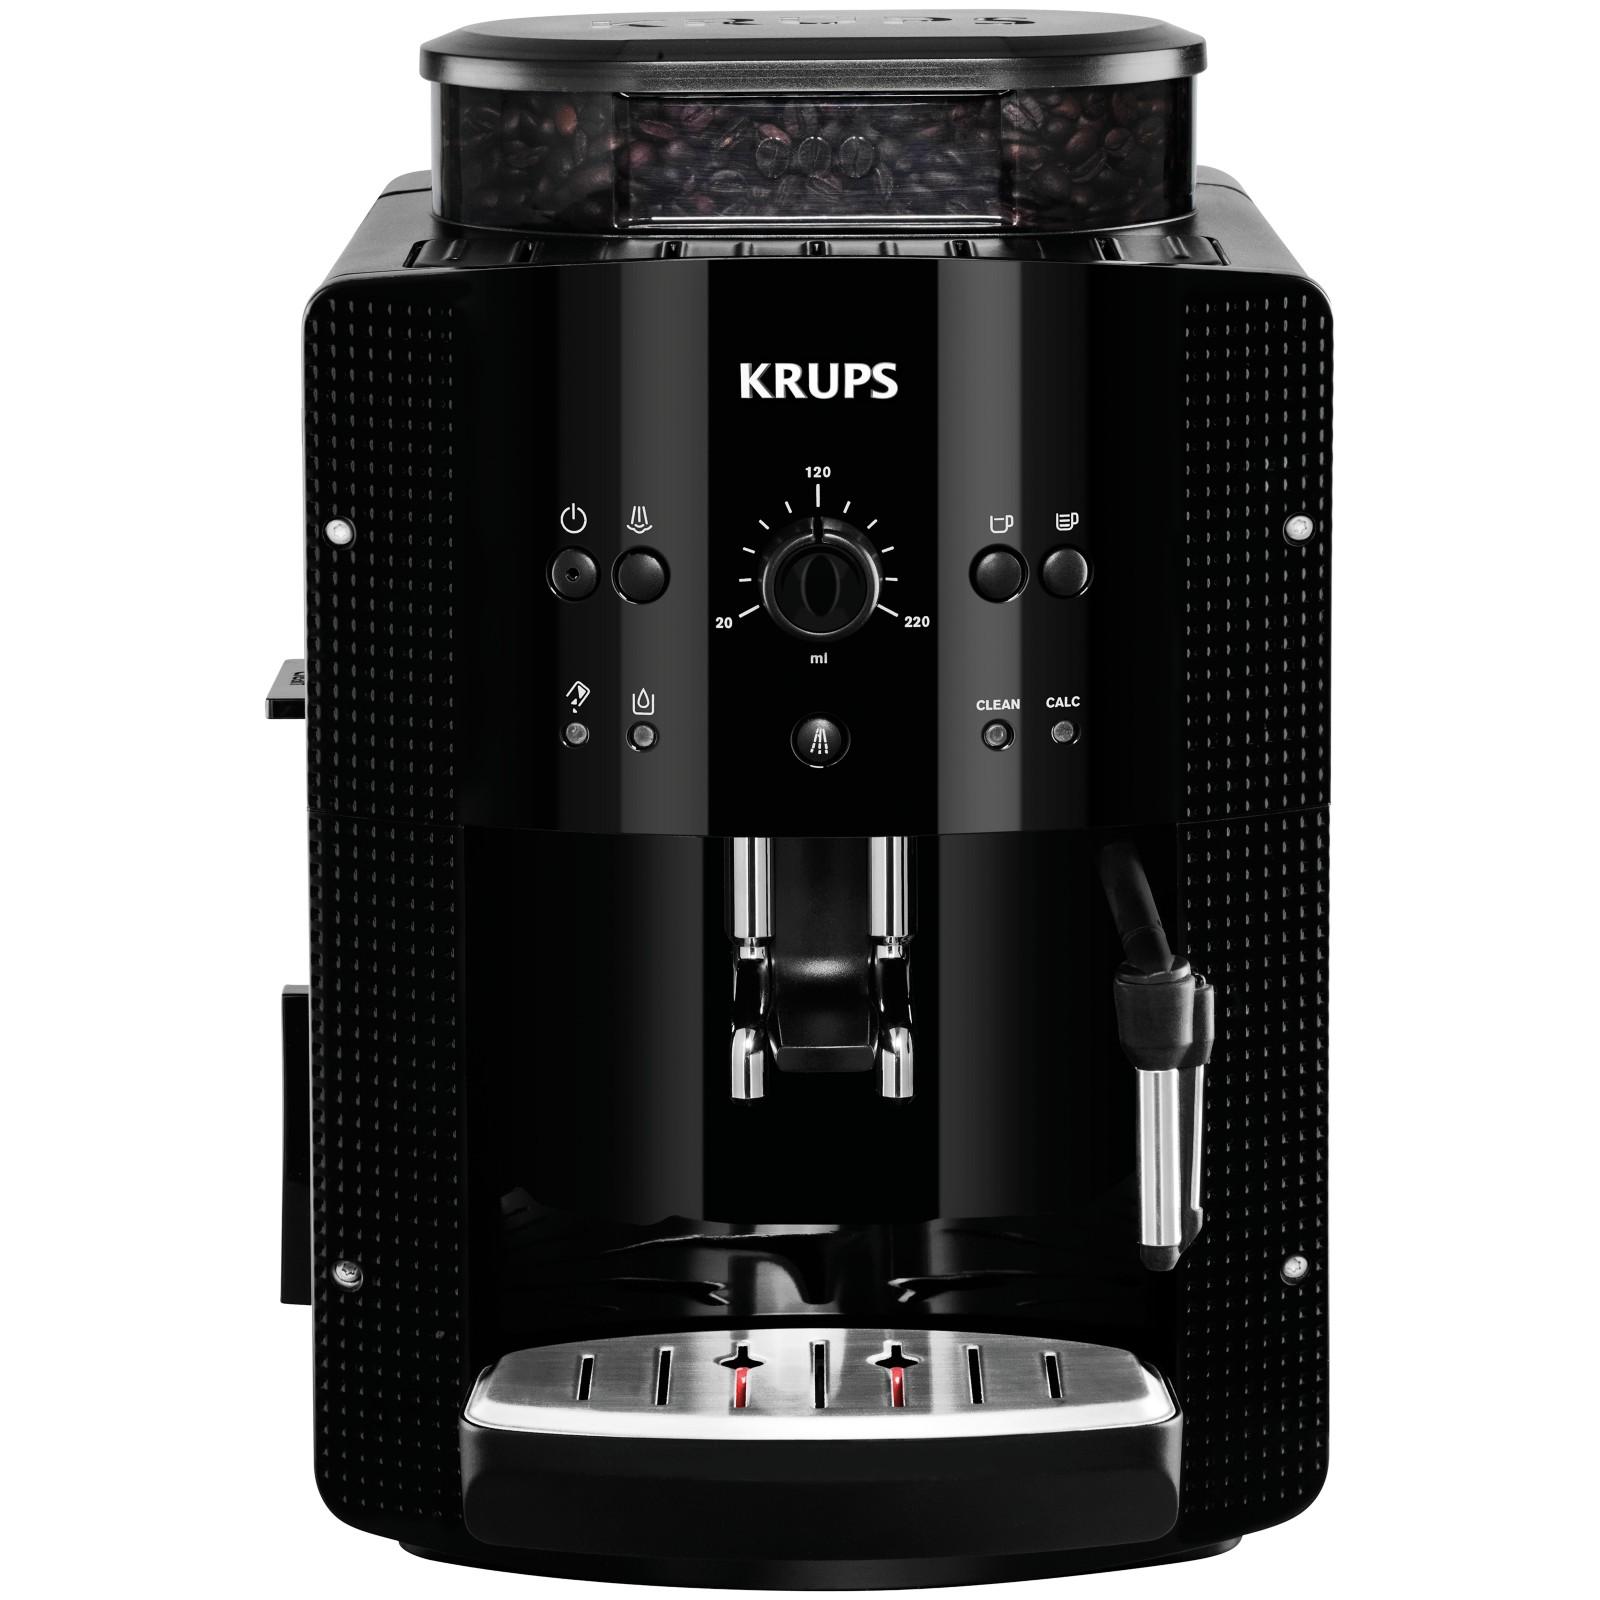 KRUPS EA8108 Espresseria Bean-to-Cup Coffee Machine